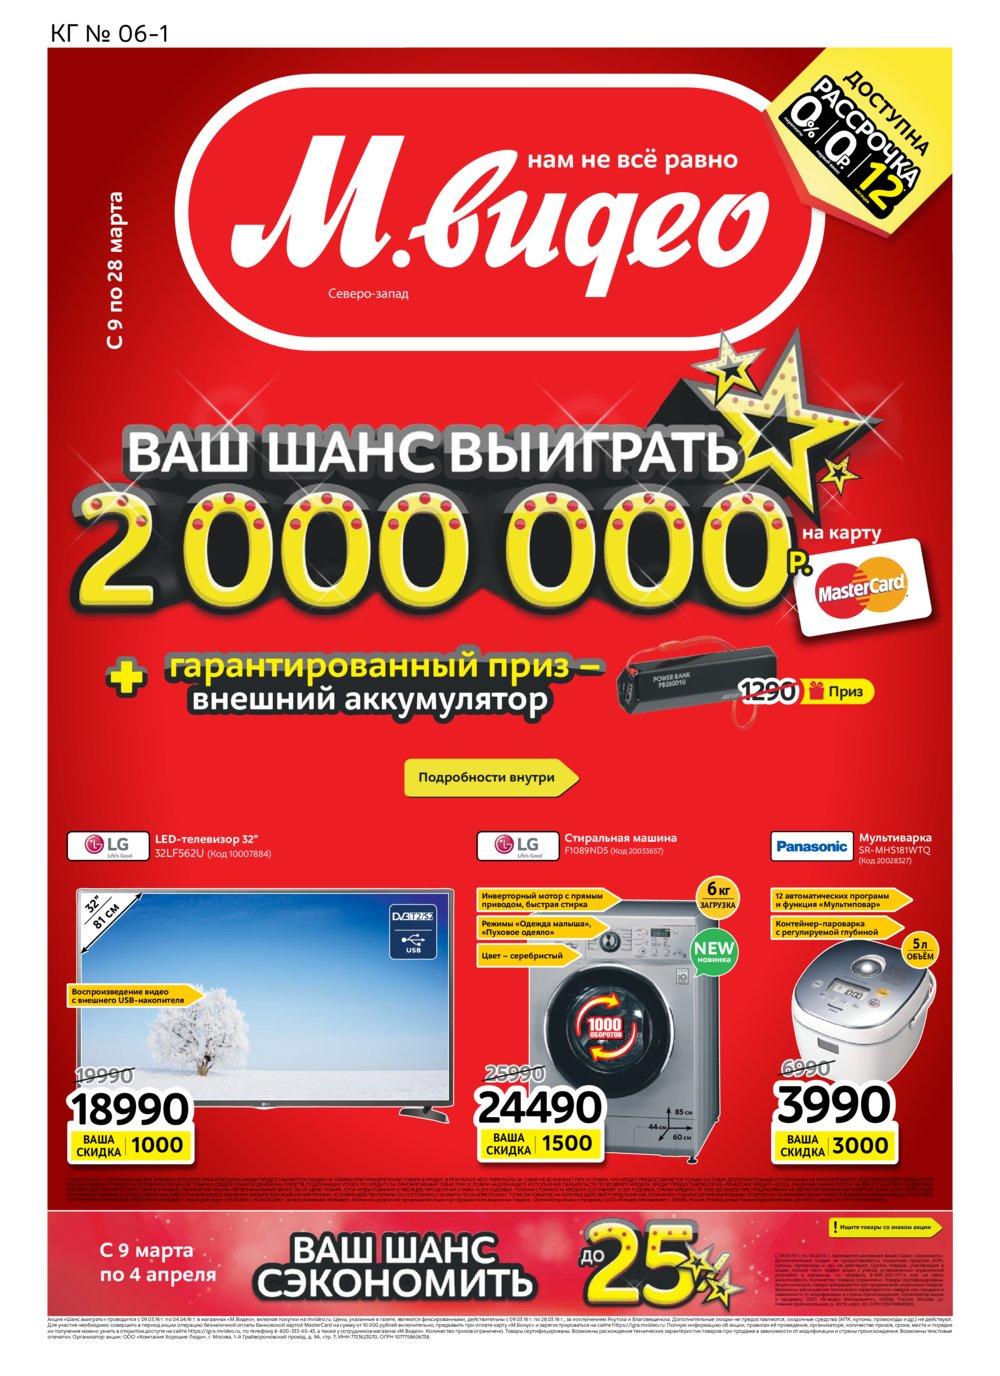 Интернет Магазин Мвидео Тверь